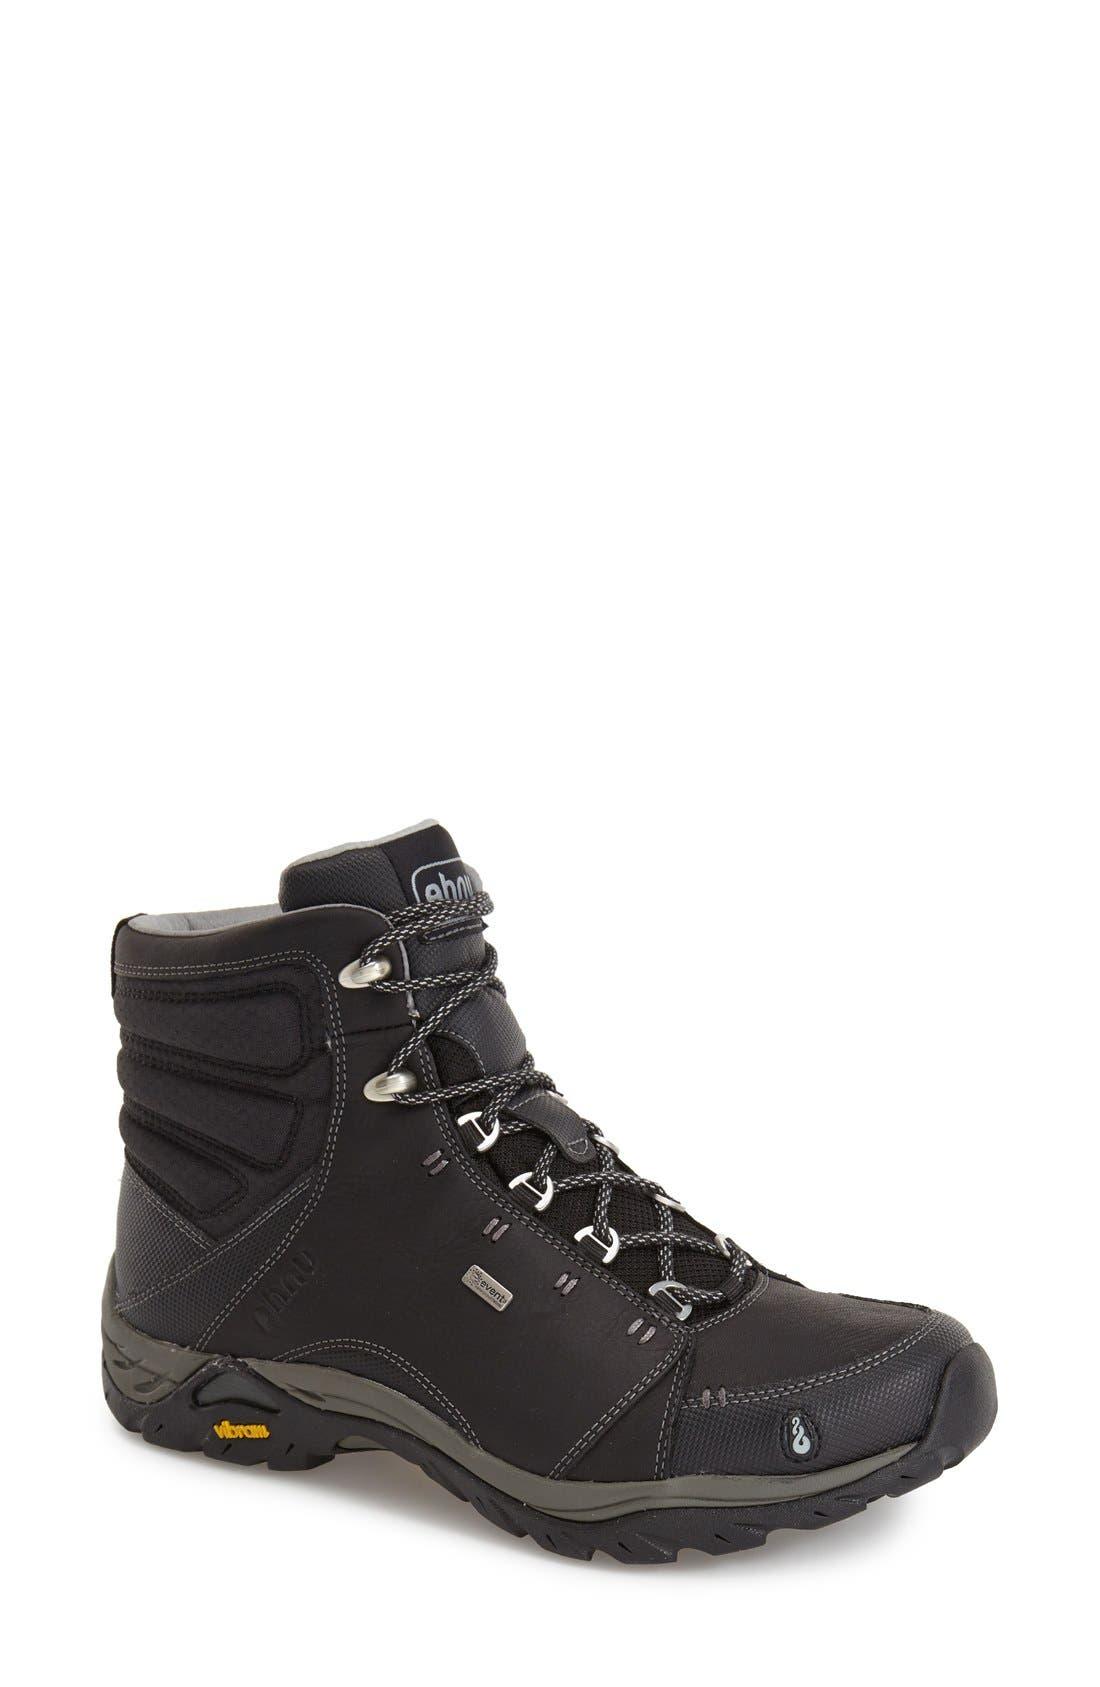 Main Image - Ahnu 'Montara' Boot